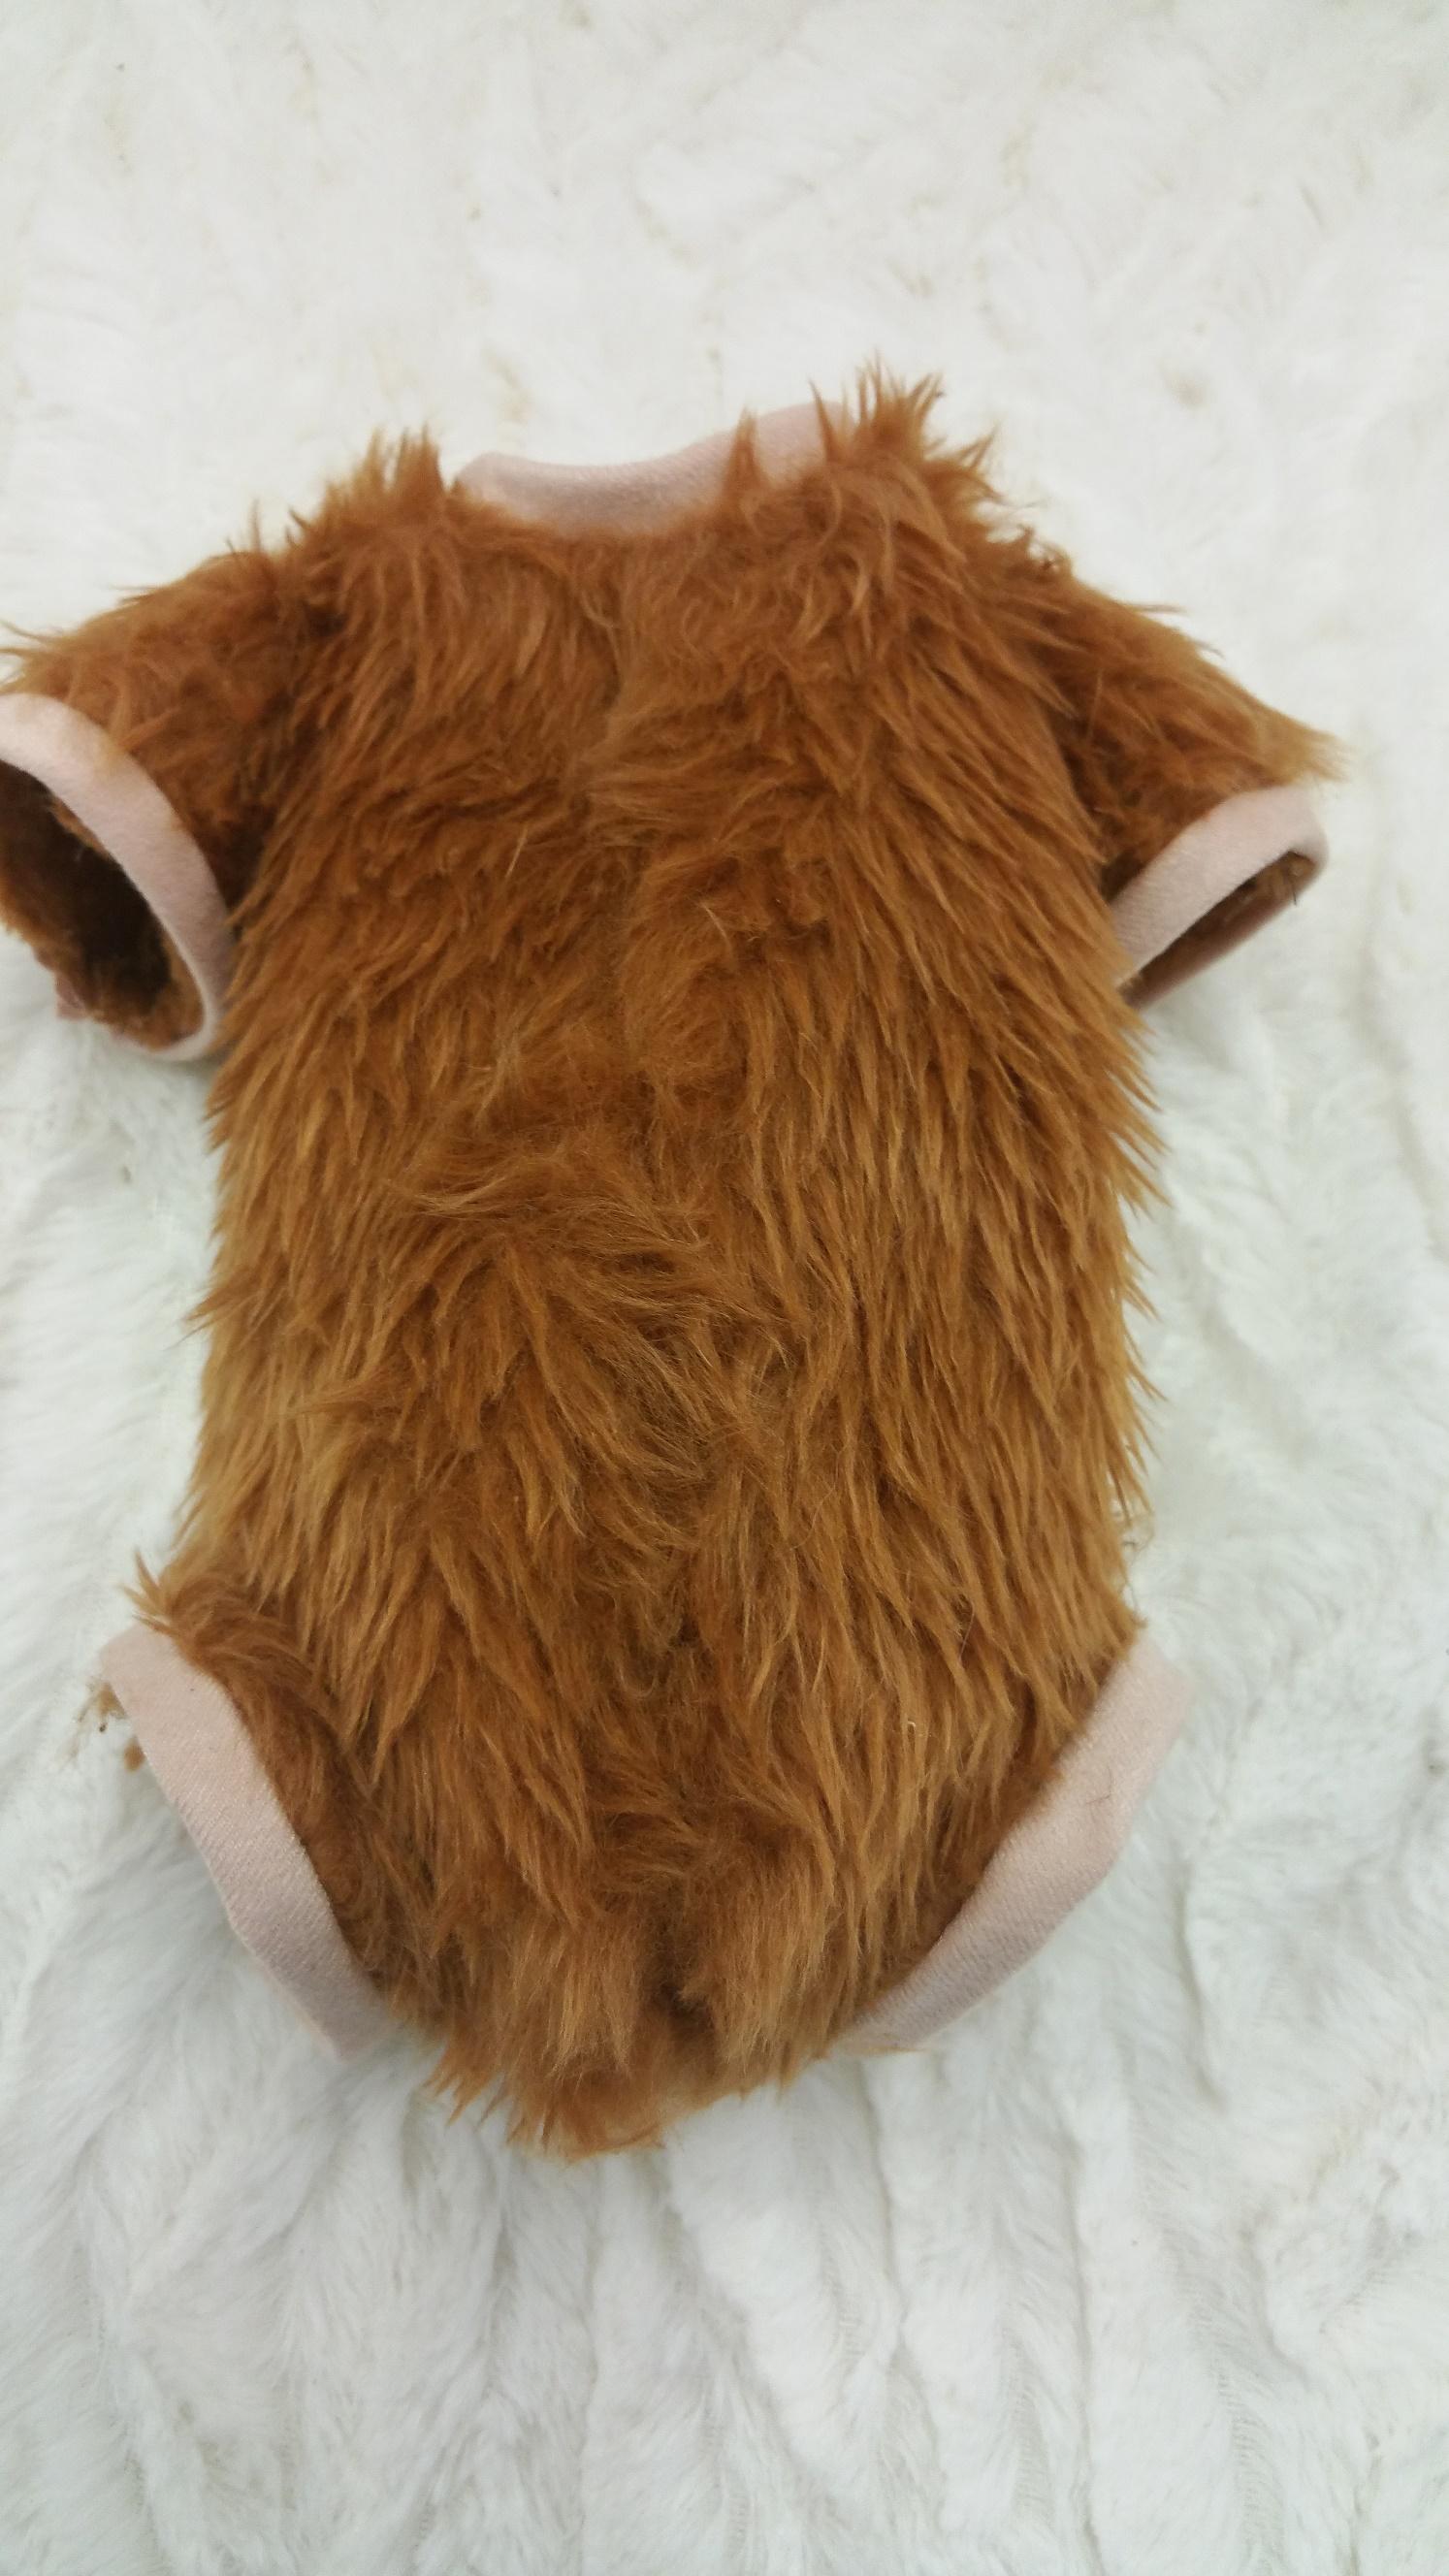 Fur Orangutan Monkey Luxury Tinkerbell Body